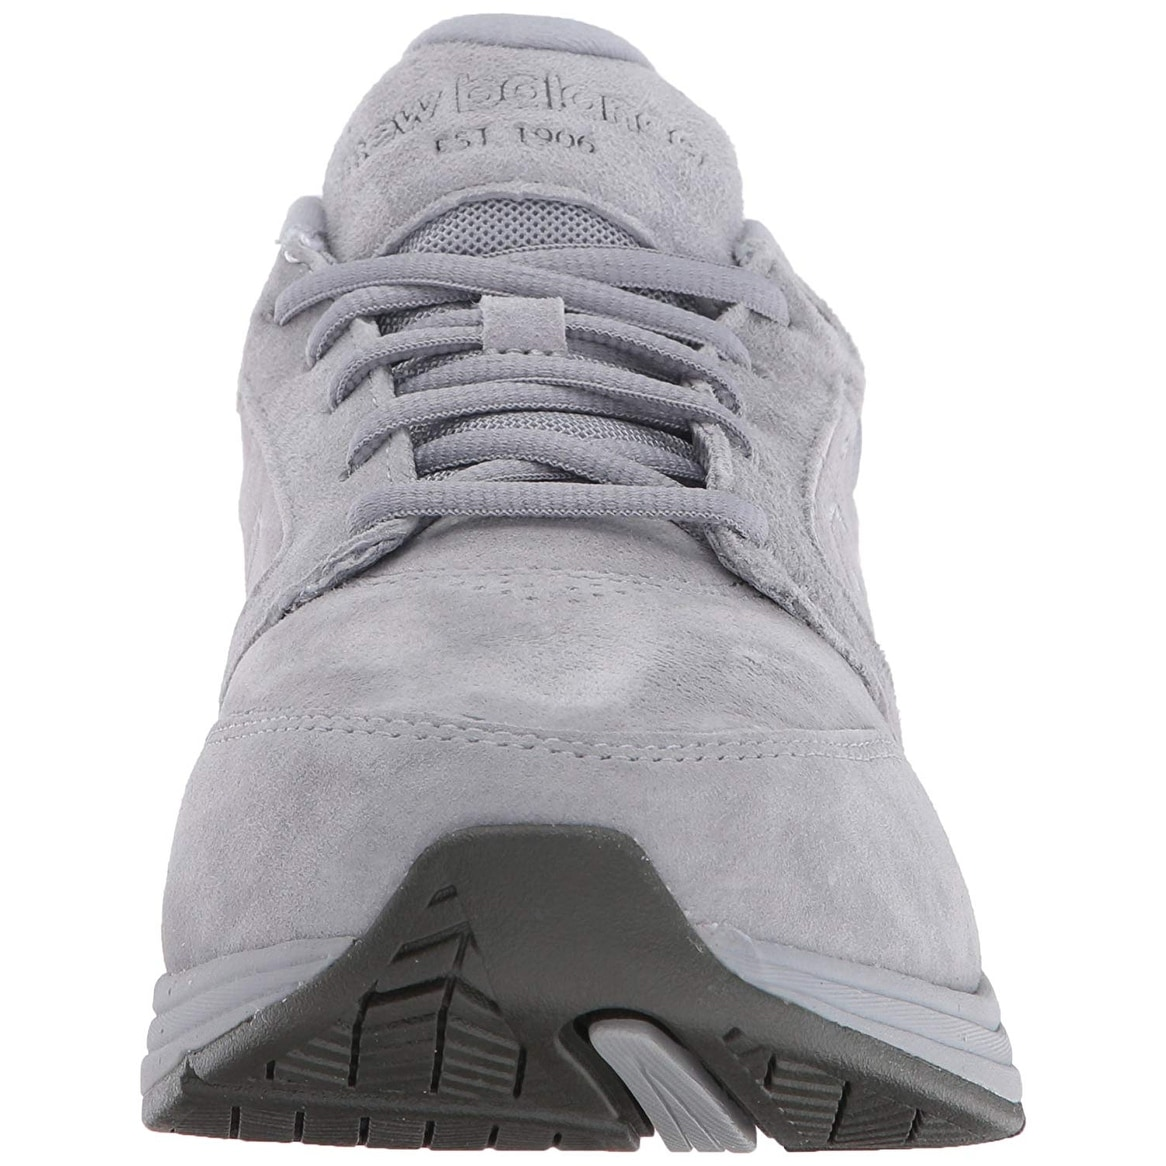 Mw928v2 Walking Shoe-M